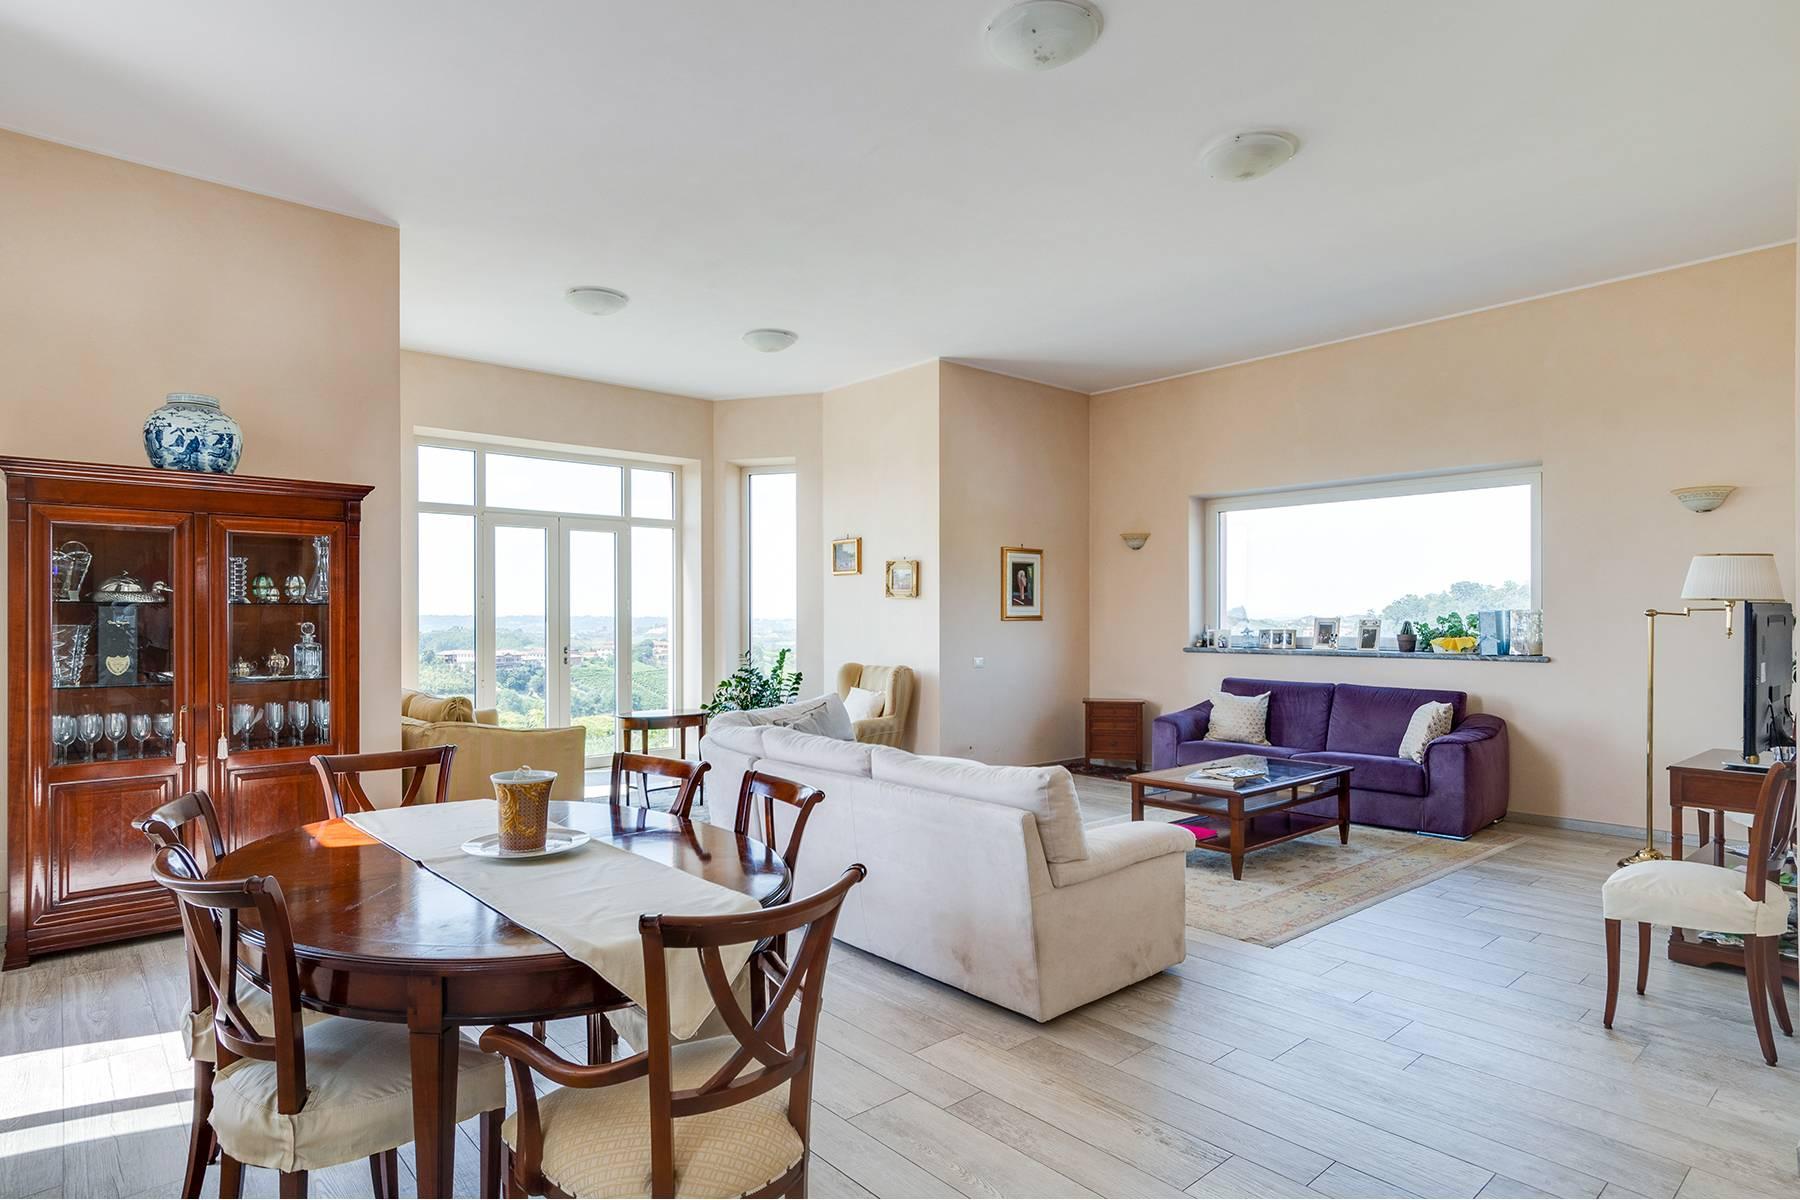 Moderne Villa im Herzen des Roero Gebiets - 8